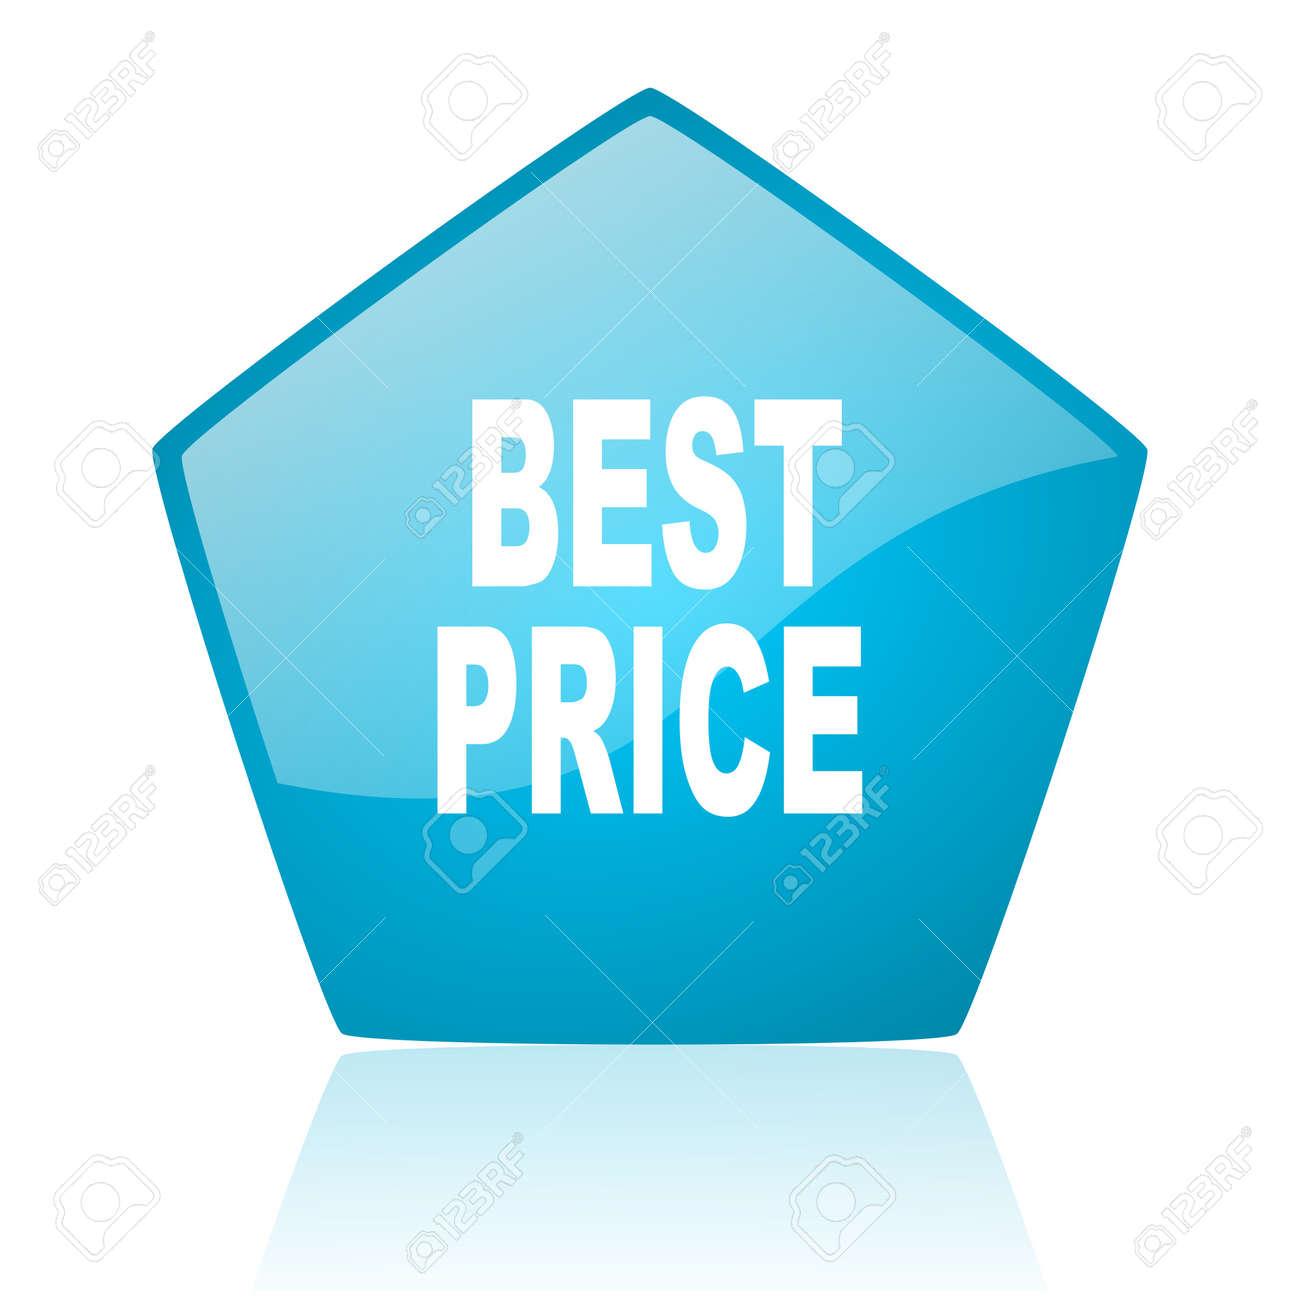 best price blue pentagon web glossy icon Stock Photo - 19172147